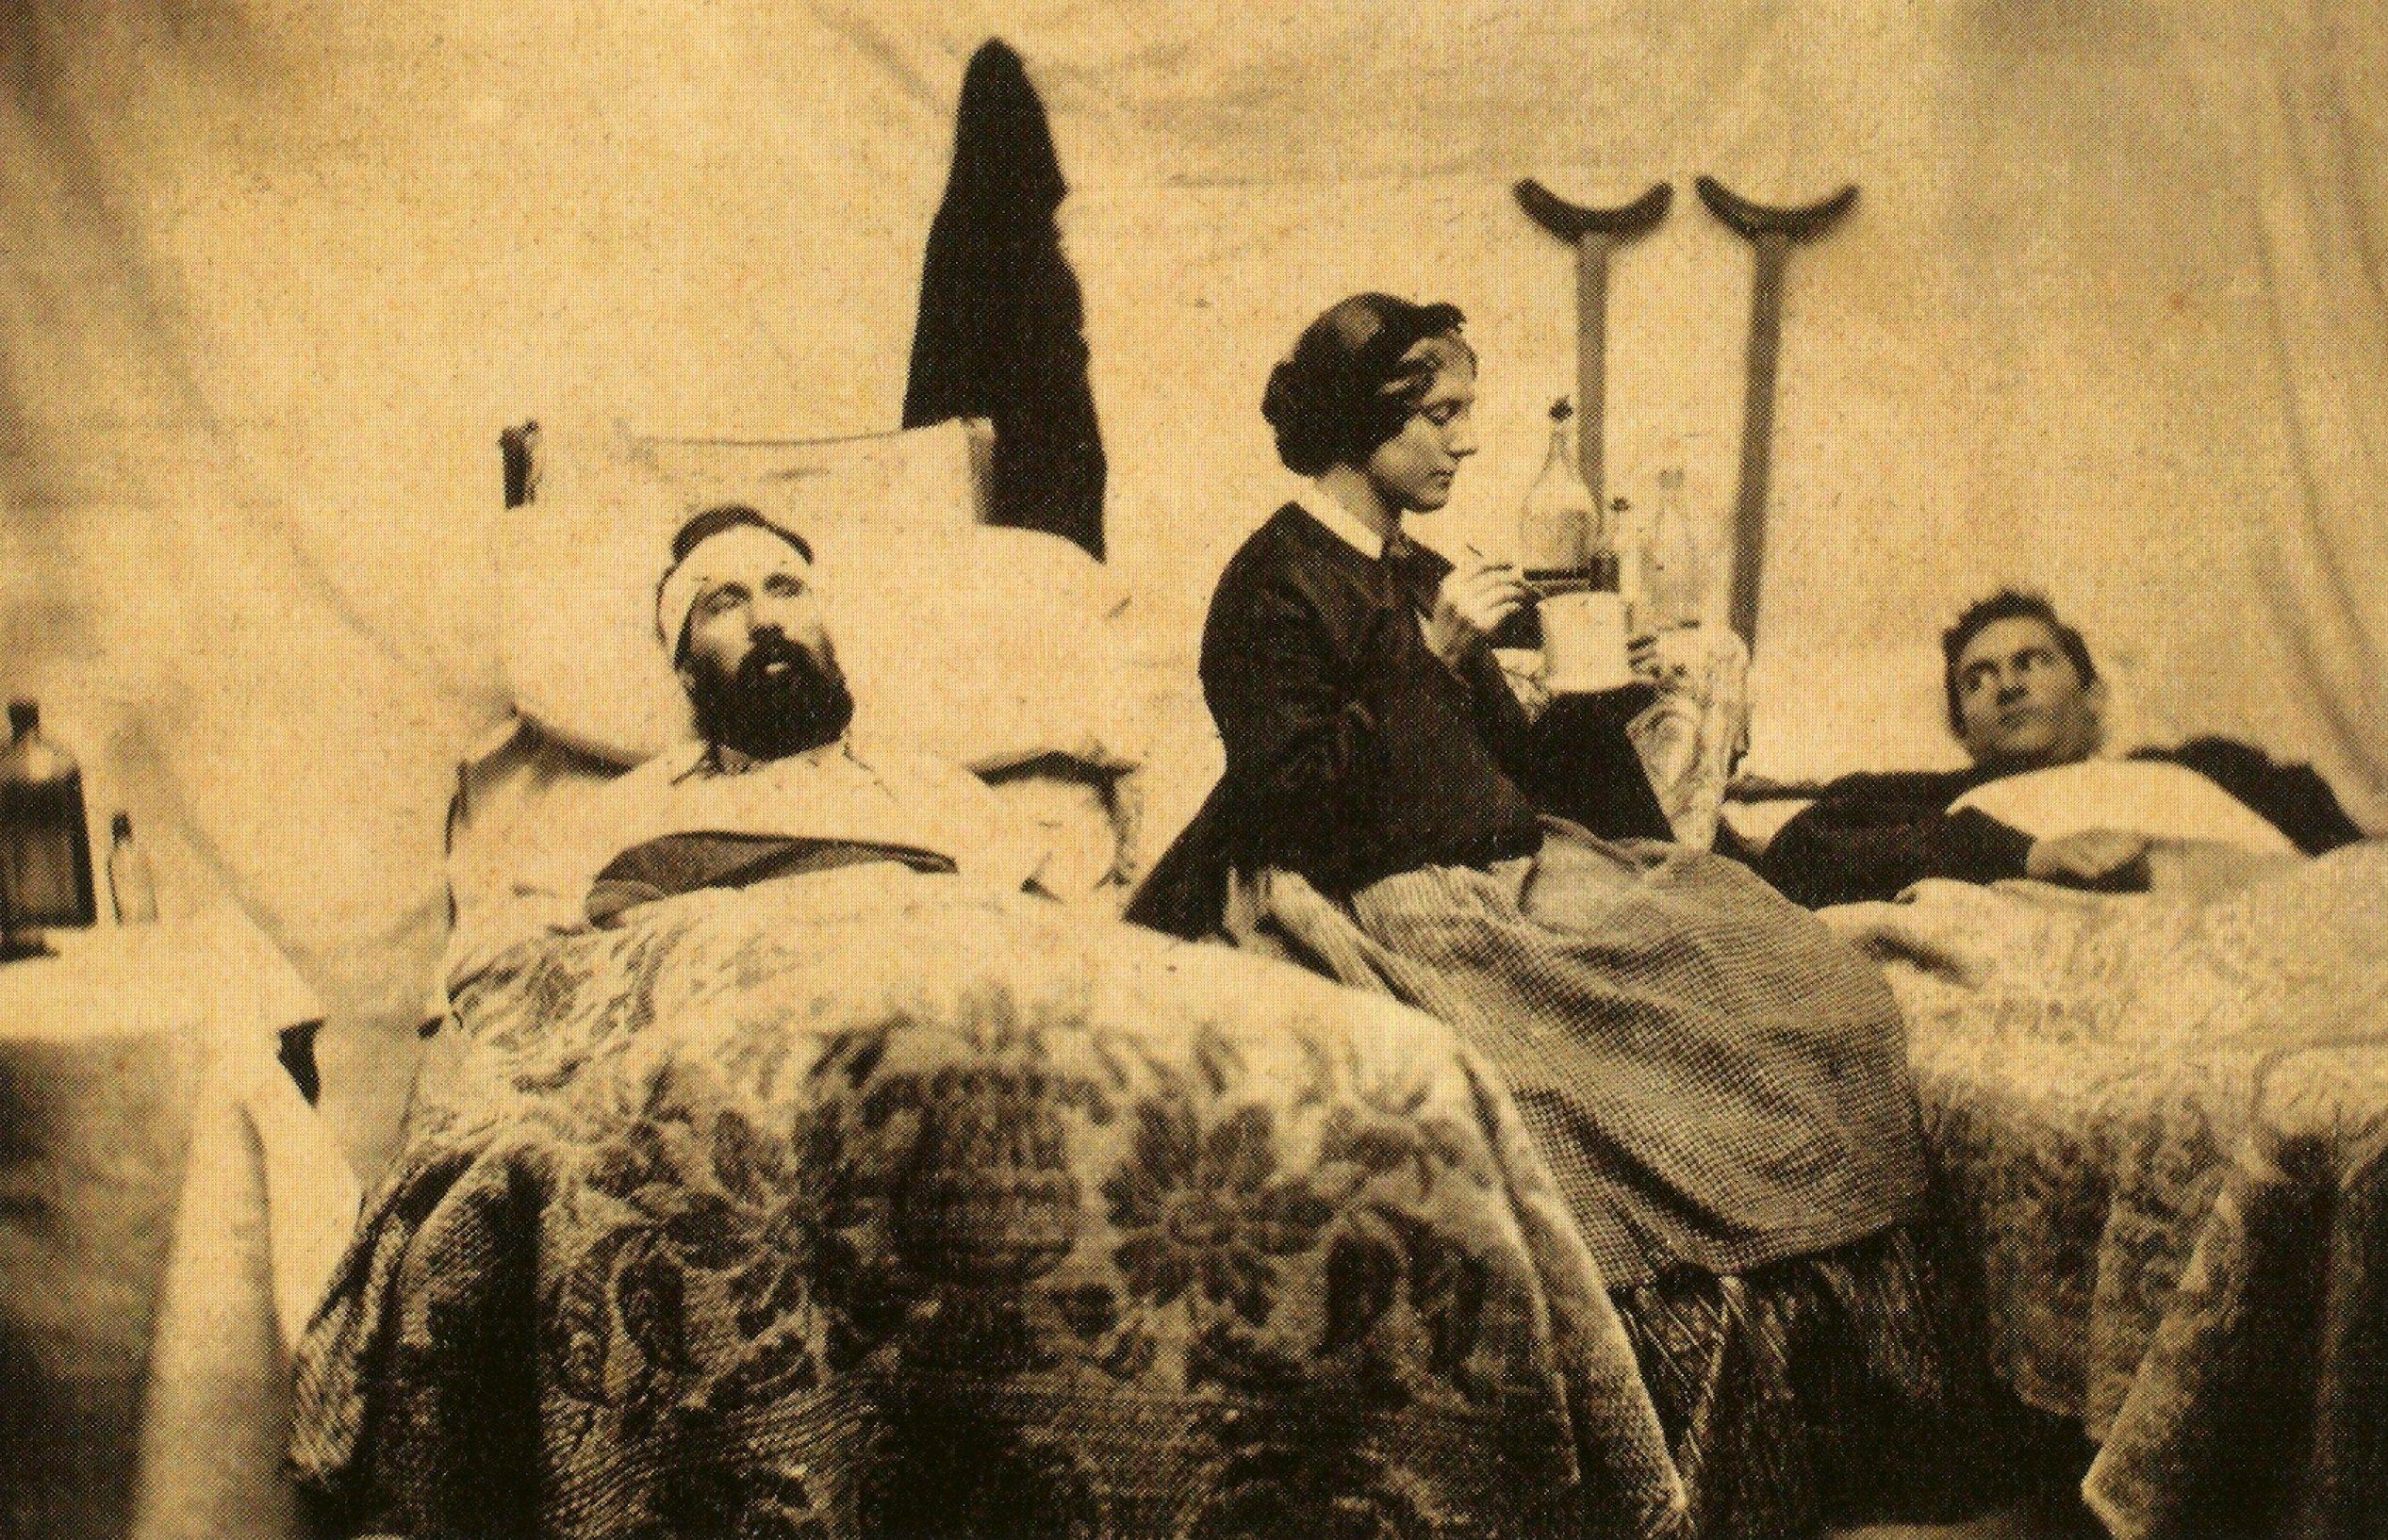 Field hospital tent. Is she a Sanitary Commission nurse ...